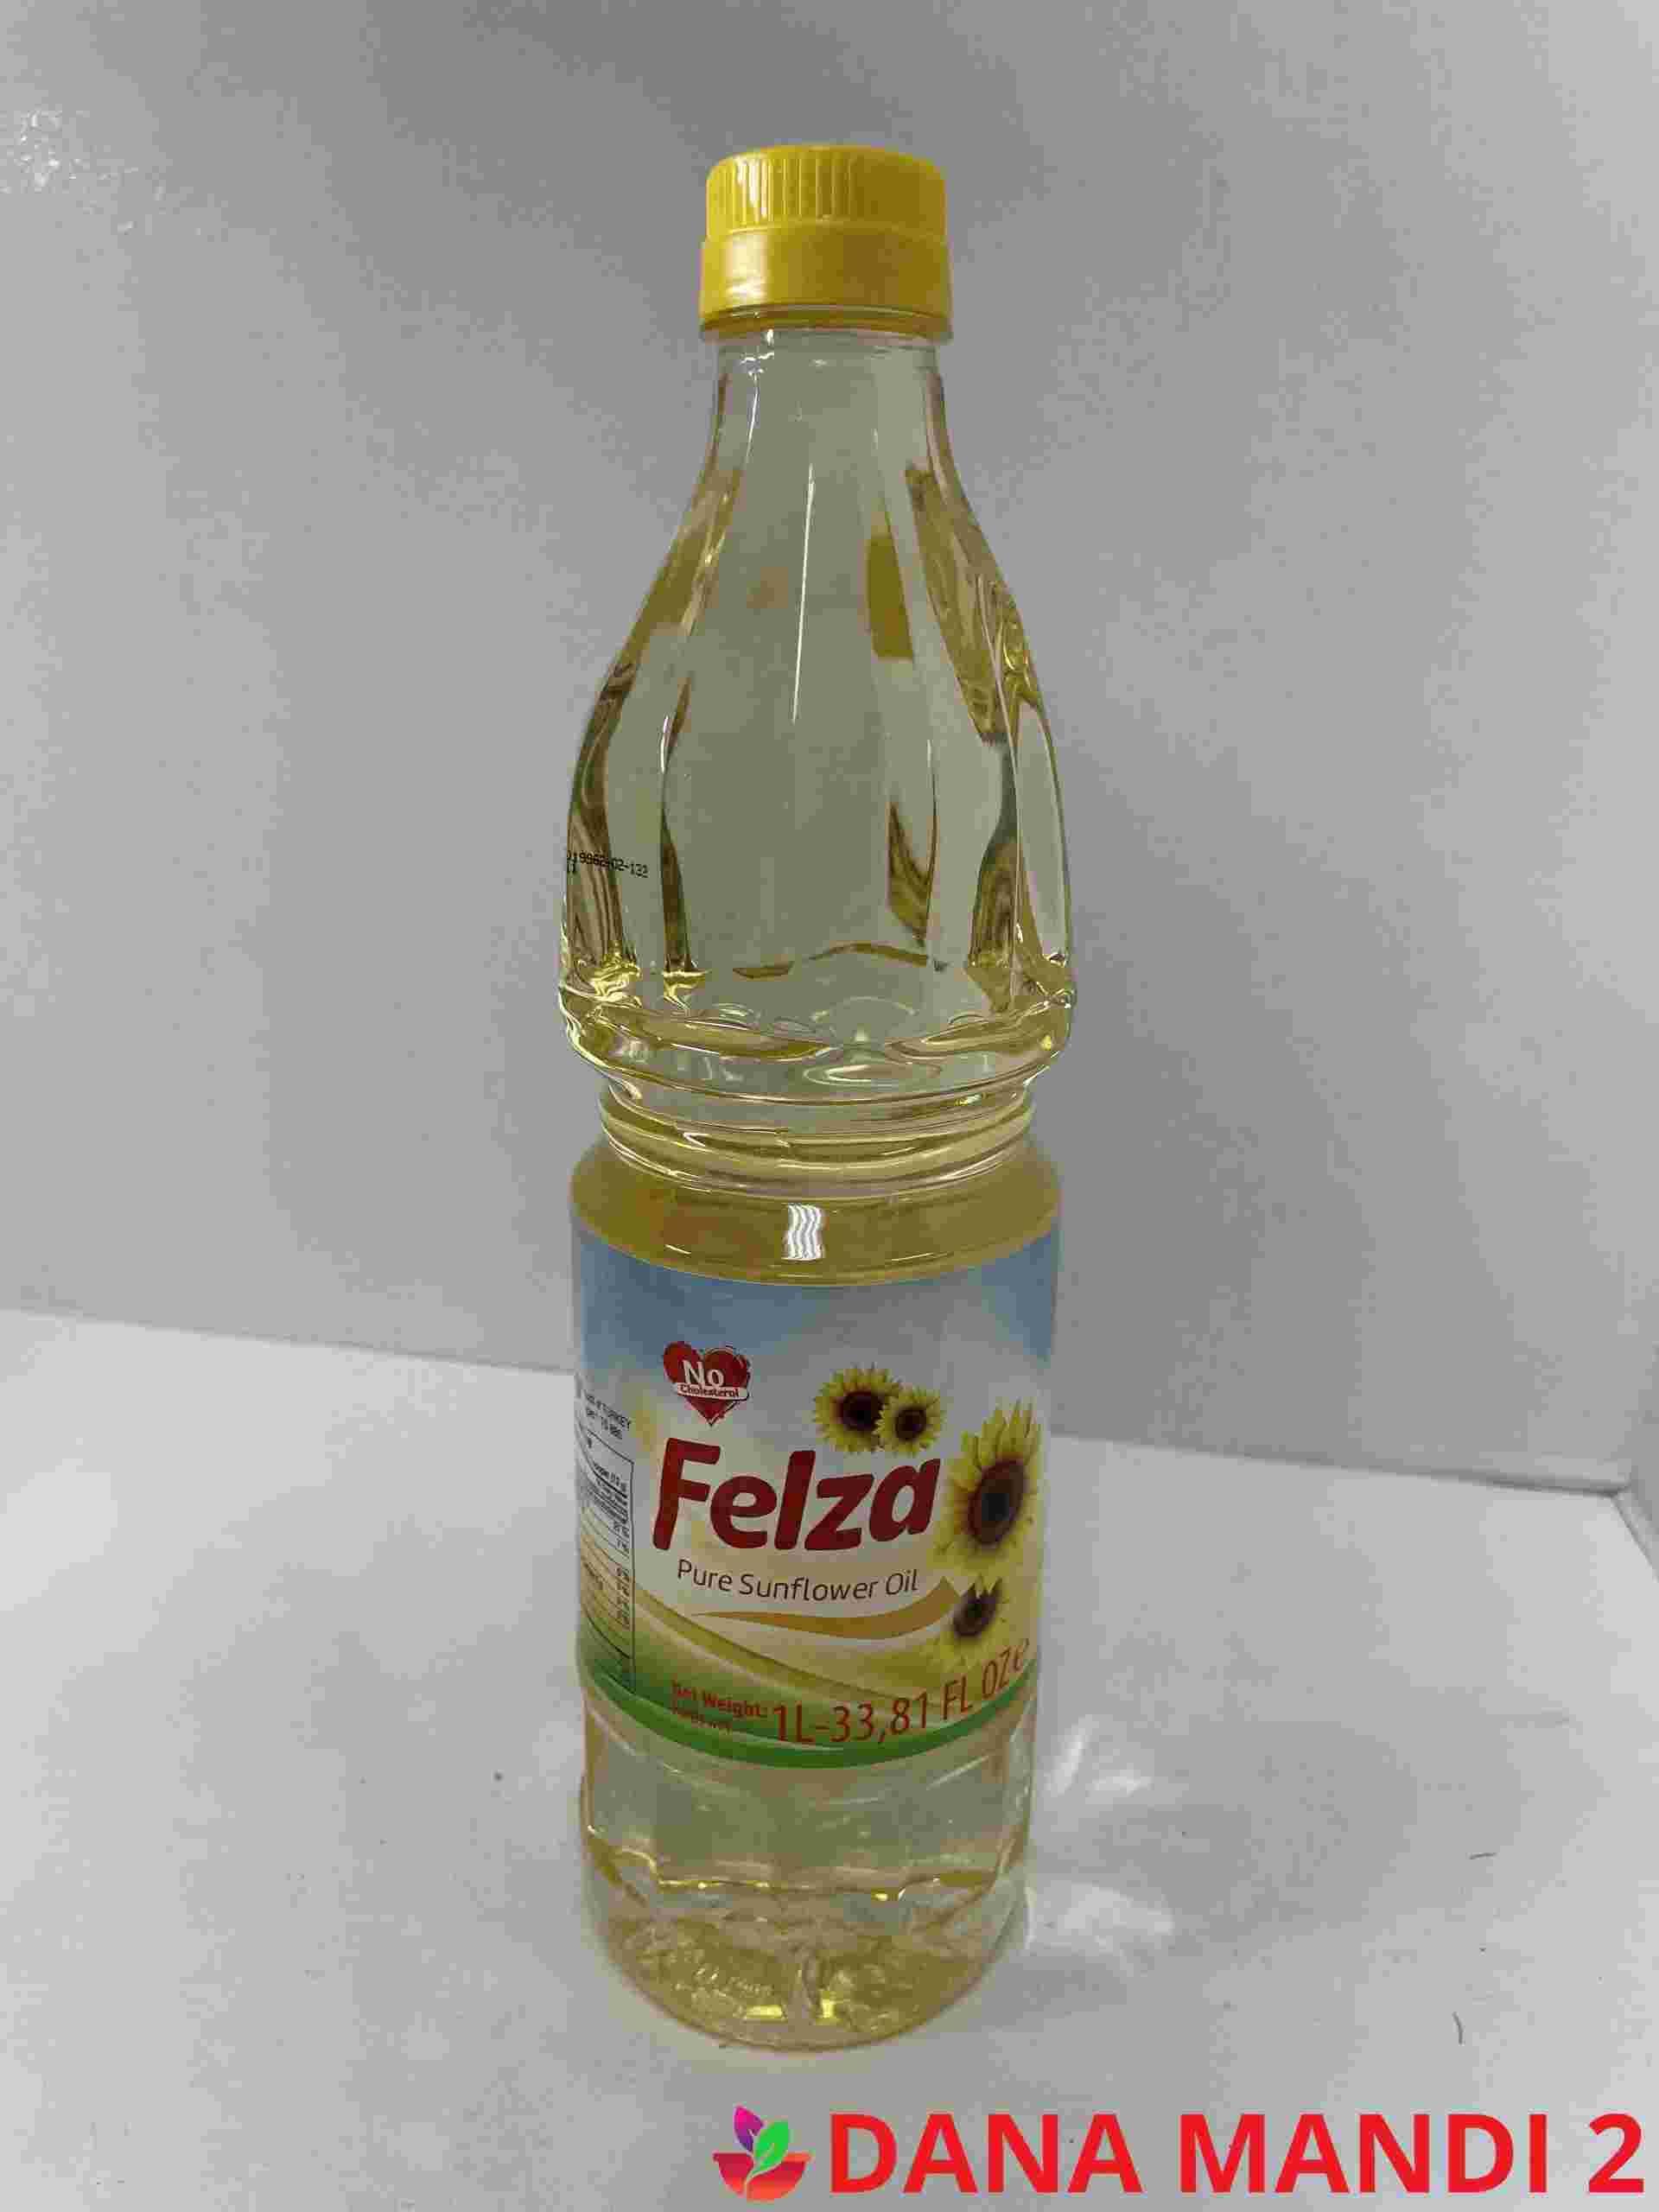 FELZA Sunflower Oil